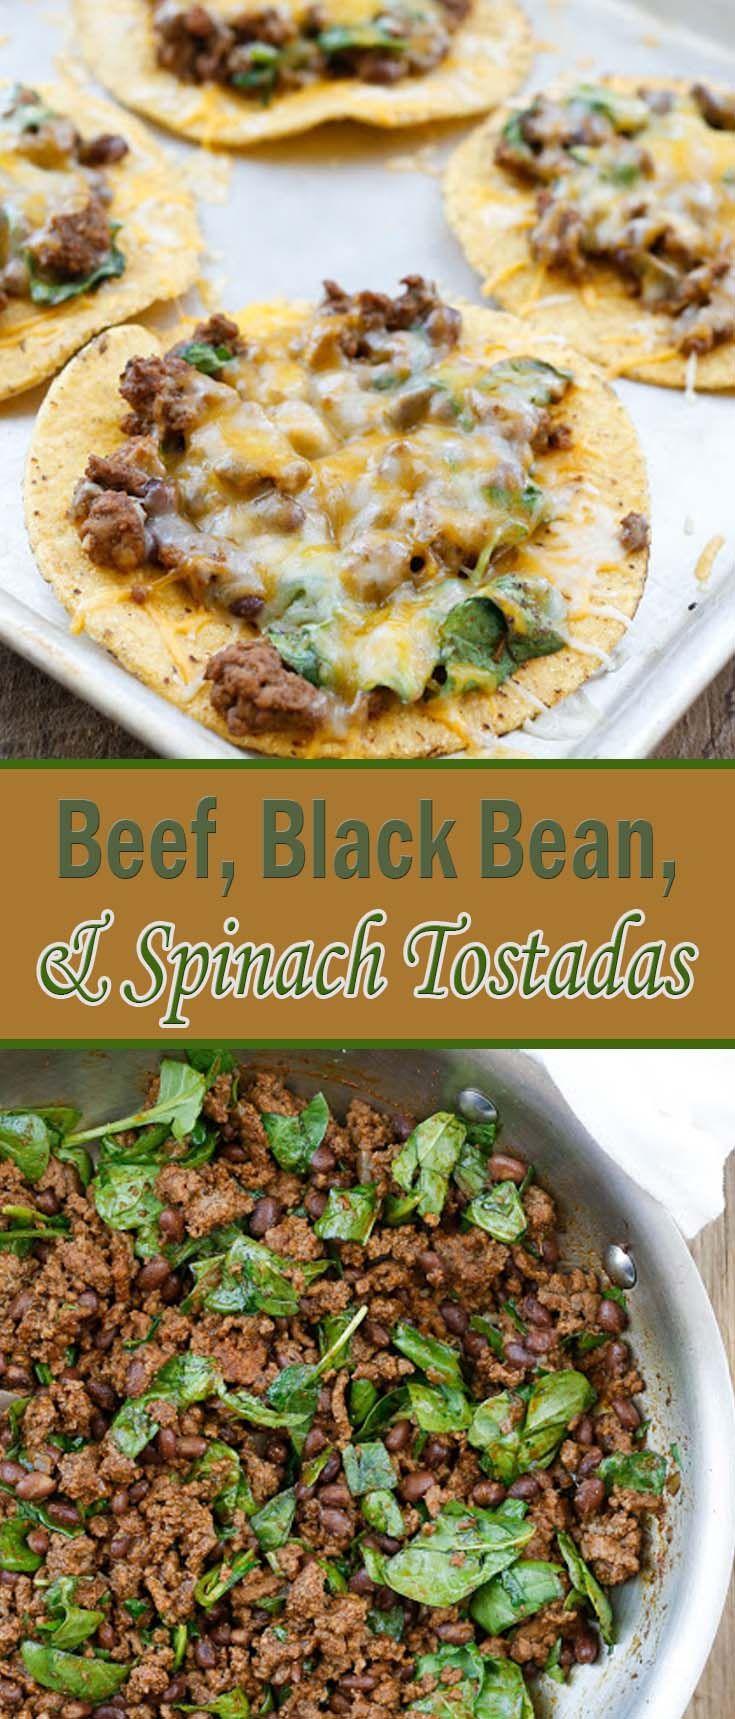 Beef, Black Bean, and Spinach Tostadas